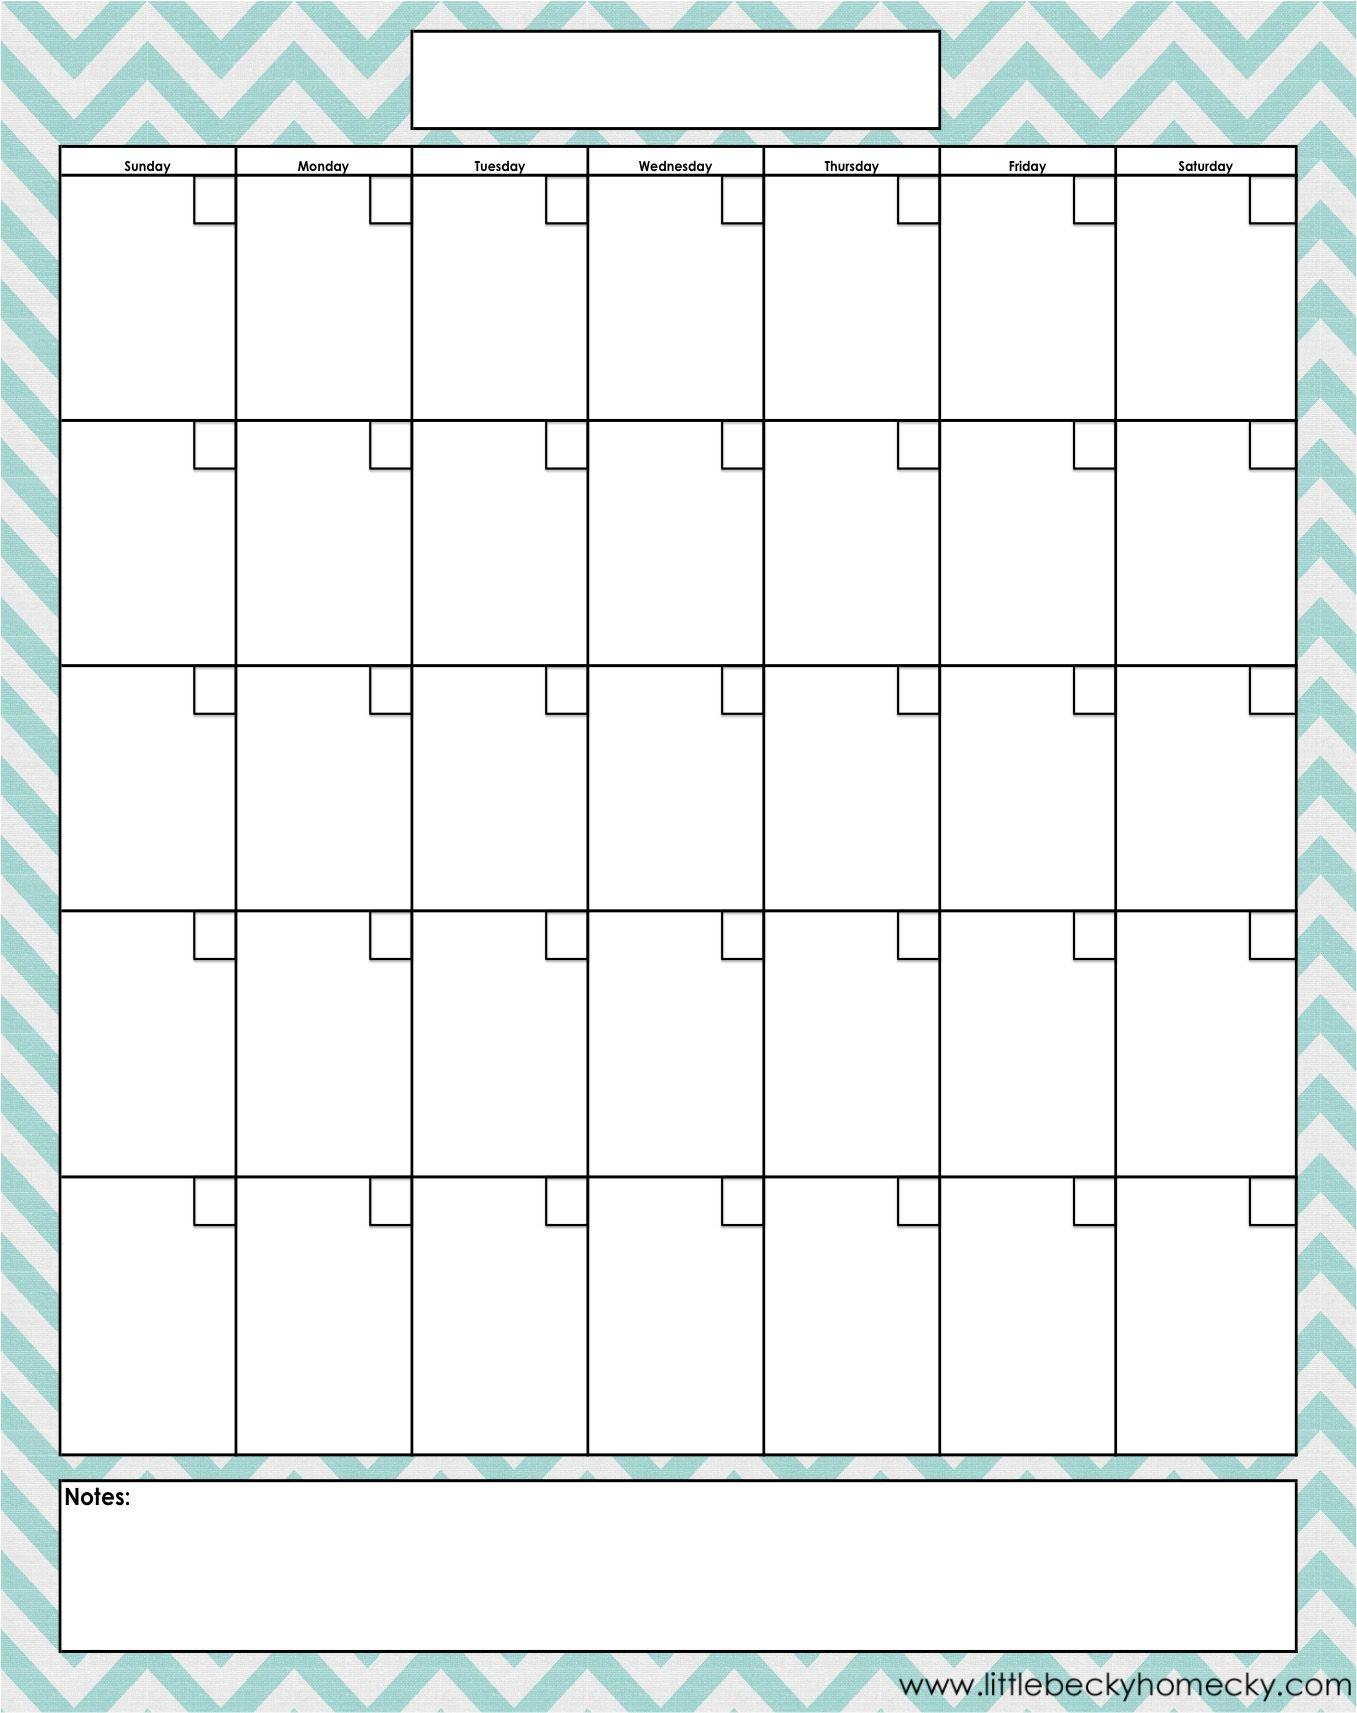 Blank Fill In Calendar | Calendar Template Printable Blank Calendar To Fill